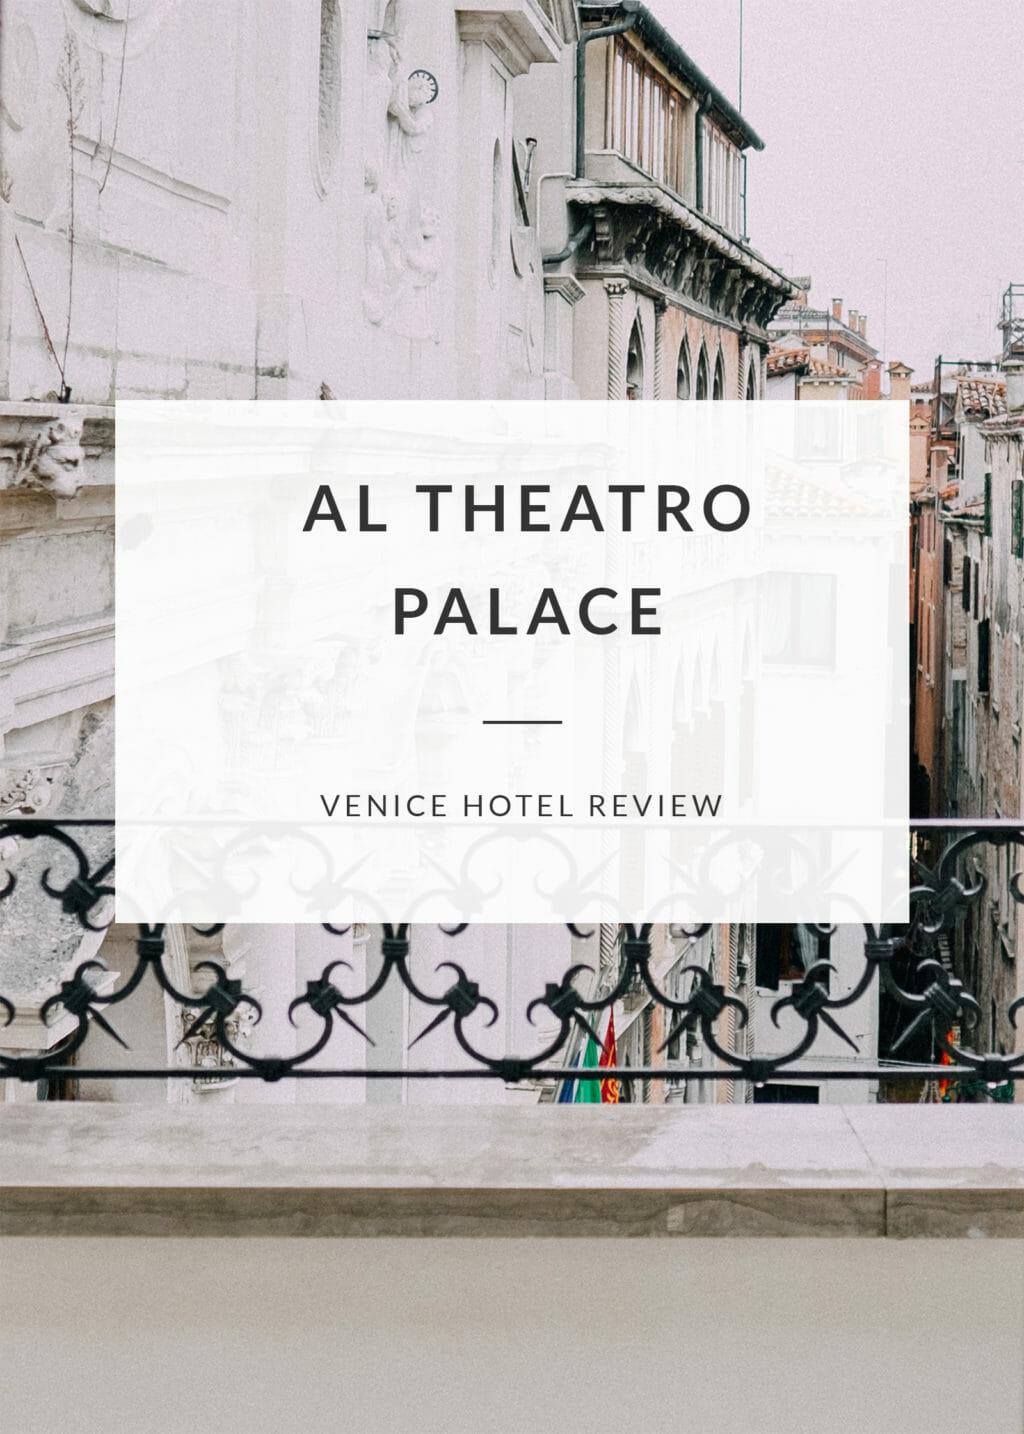 Al Theatro Palace Hotel in Venice, Italy